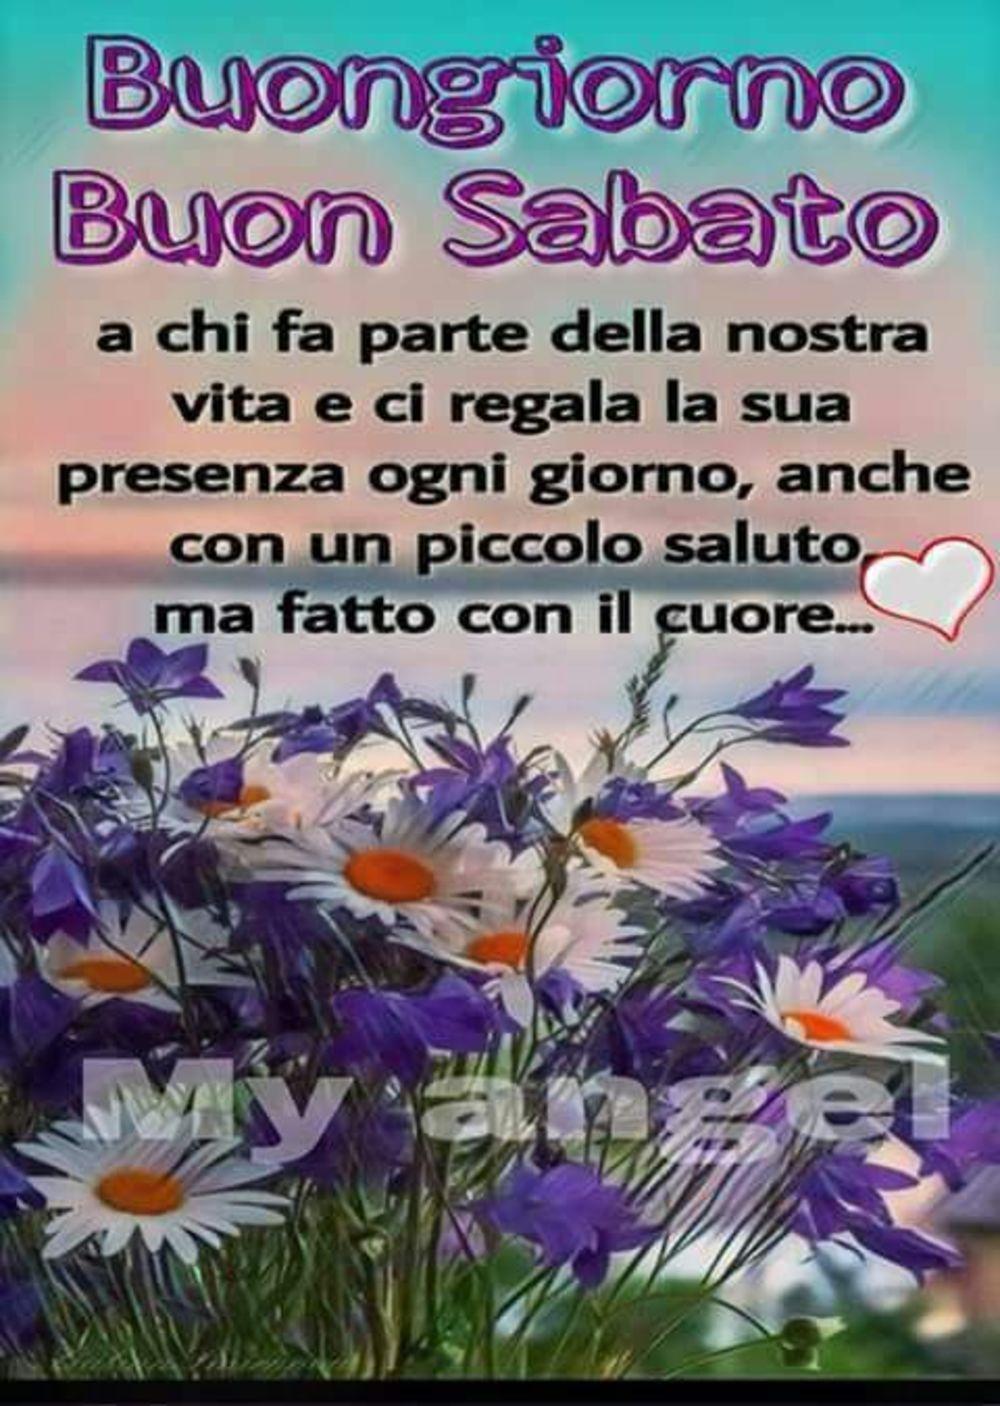 Buon Sabato Bella Frase Buongiornoateit